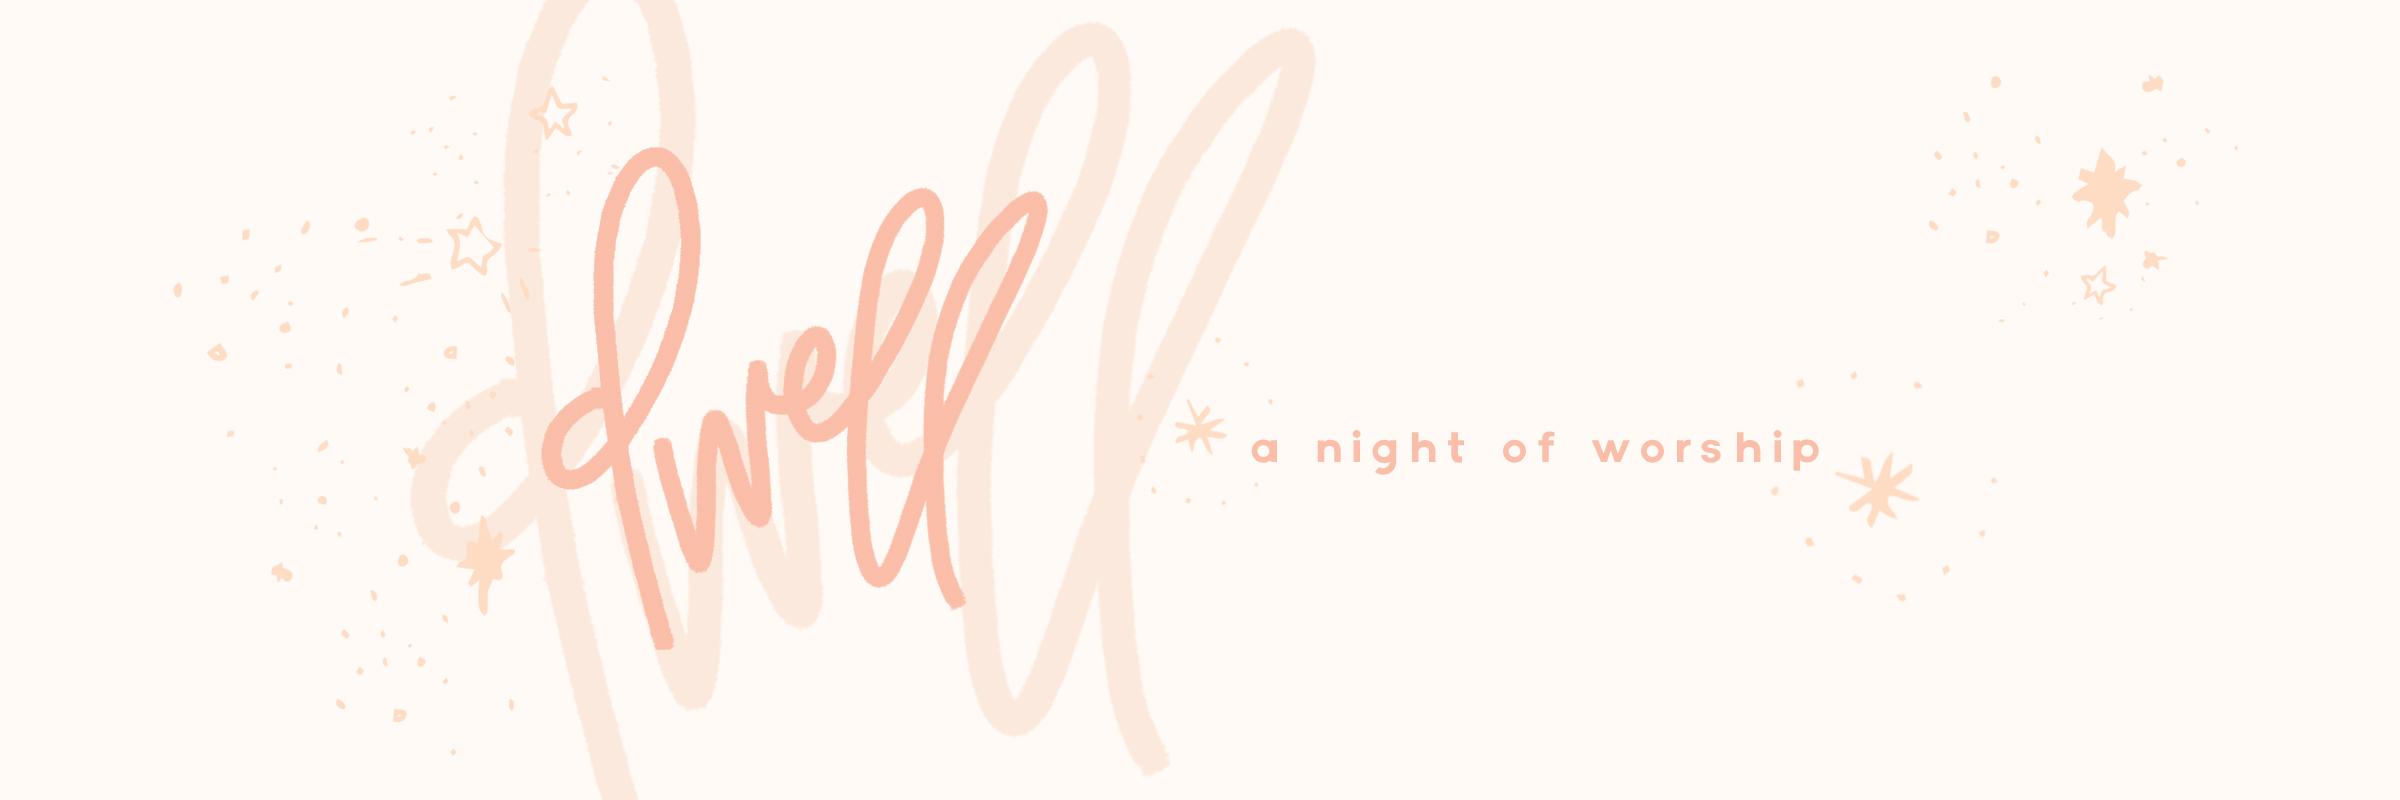 even-vanity-ends-dwell-worship-night-aug-2018-2.jpg